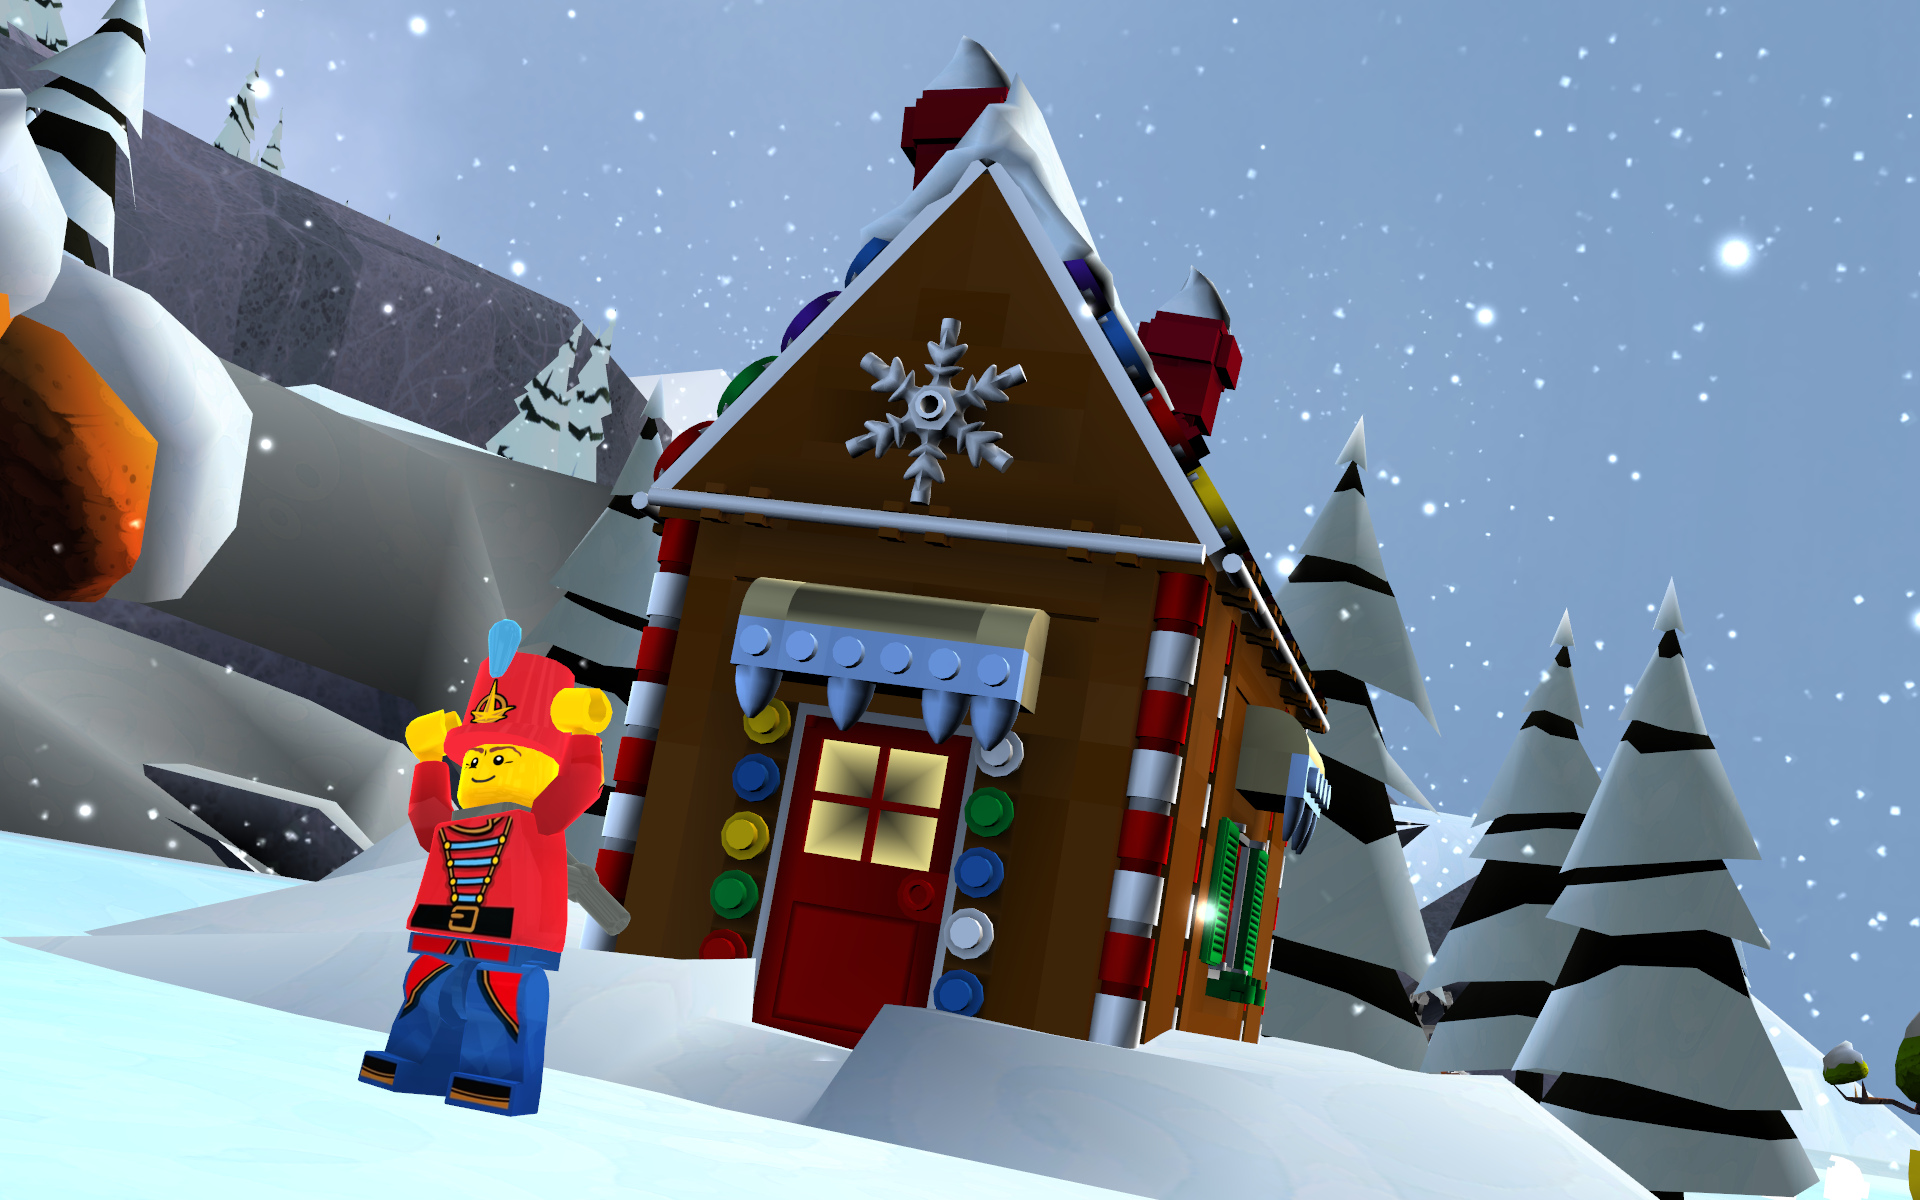 Lego Full House Image Frostburgh Gingerbread Housepng Lego Universe Wiki